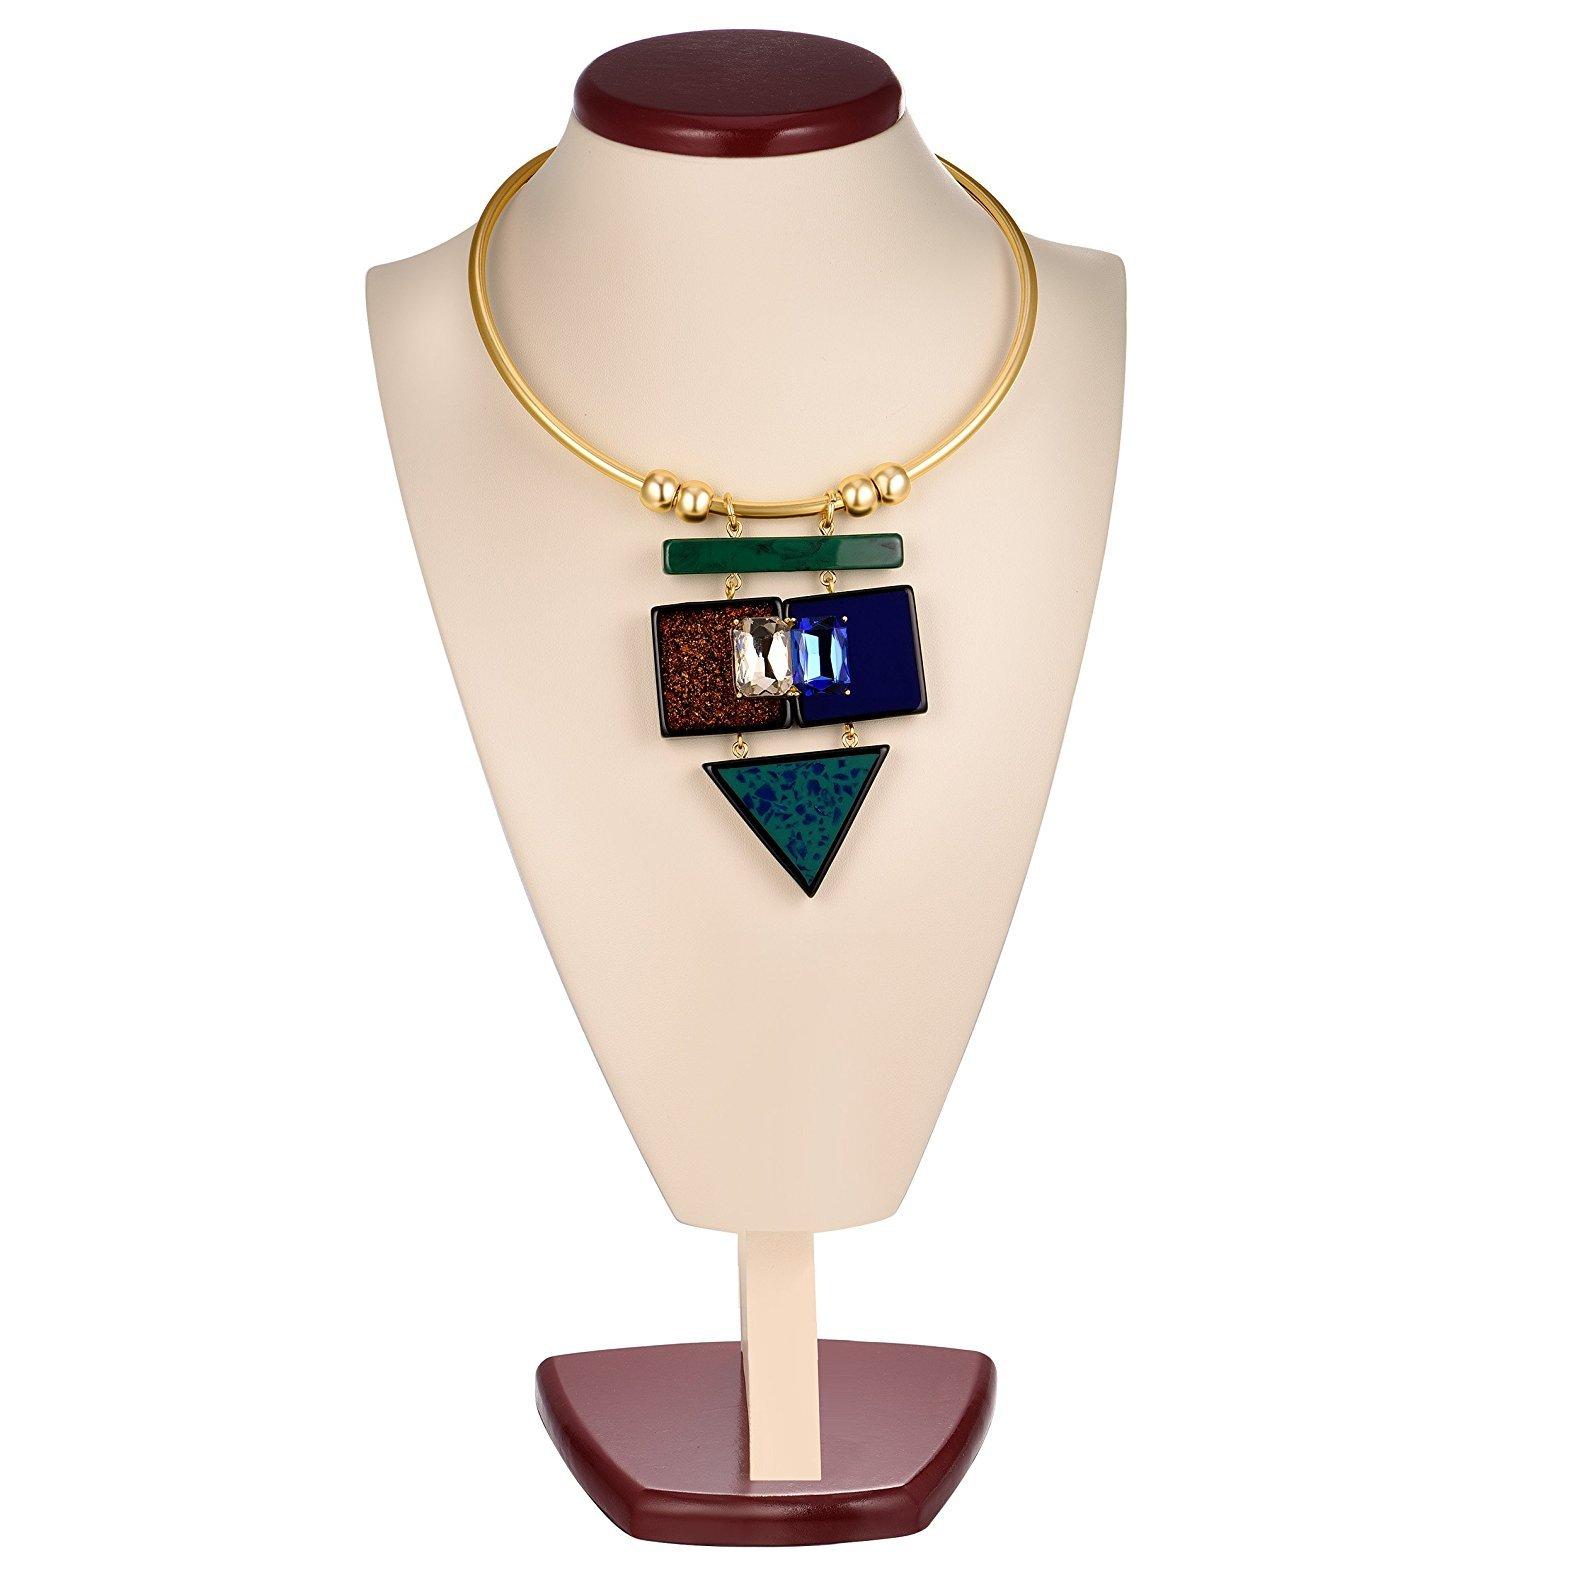 XUSY Women's Choker Collar Necklace Round Shiny Gold (Style D)